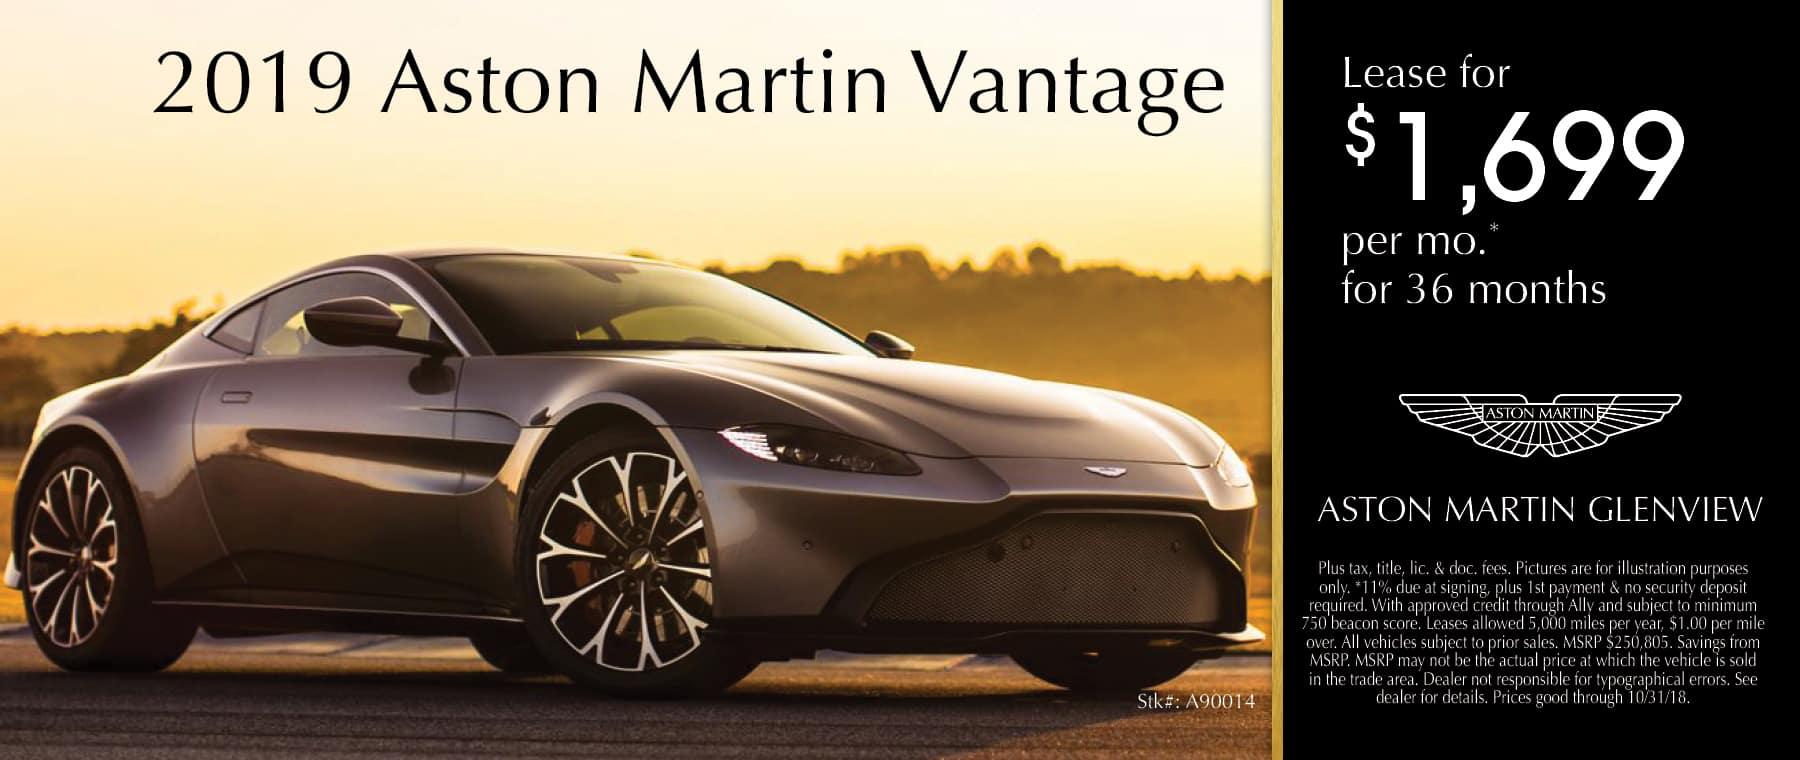 Aston Martin Of Glenview Aston Martin Dealer Serving Chicago - Aston martin chicago